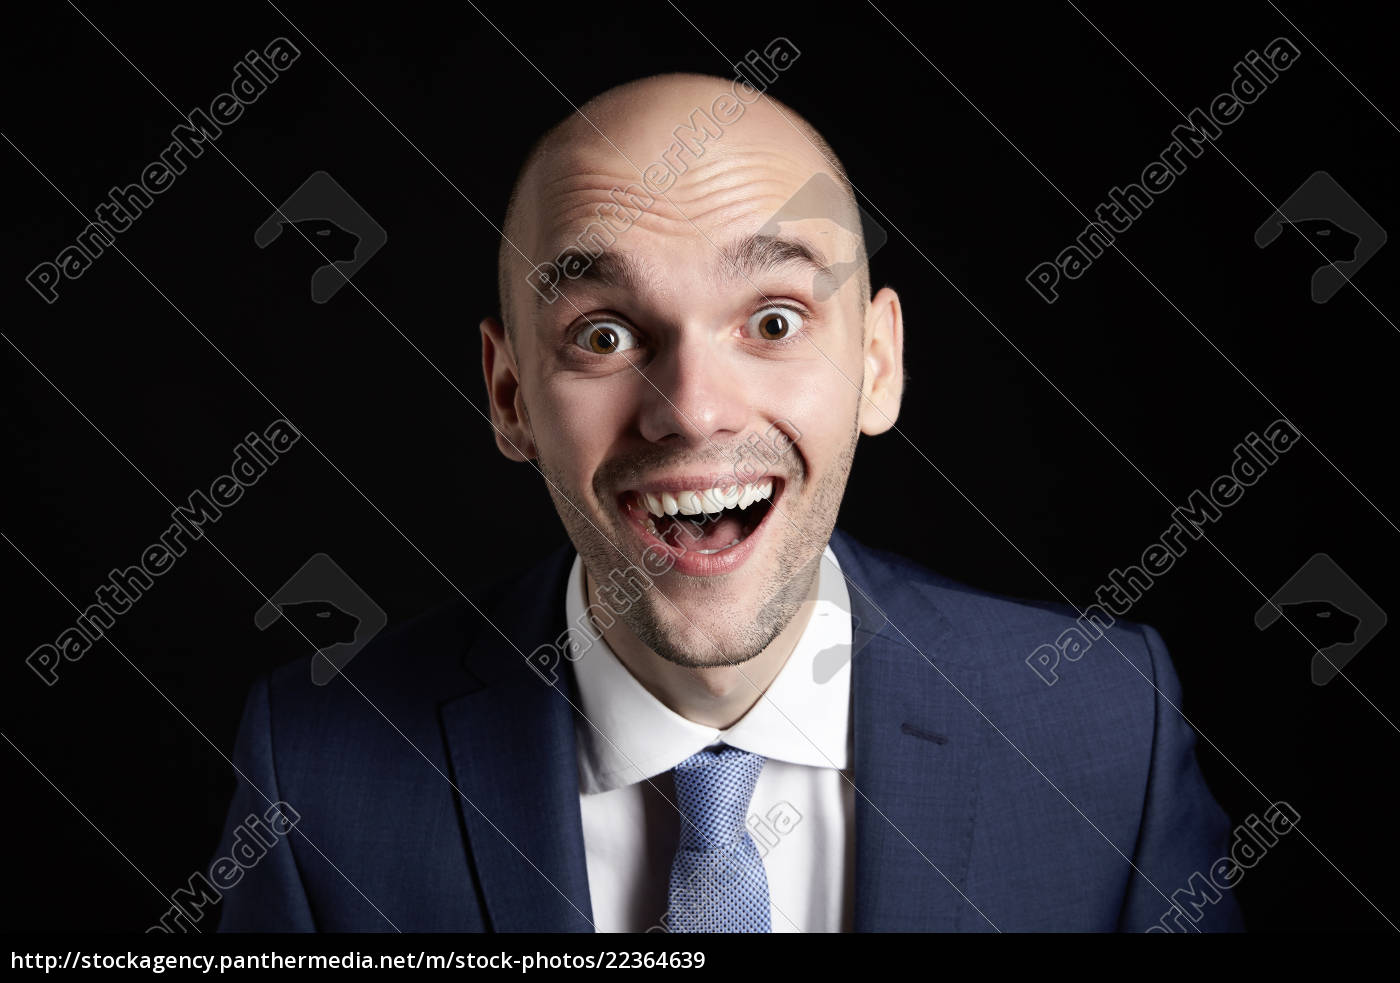 happy, man, in, suit - 22364639